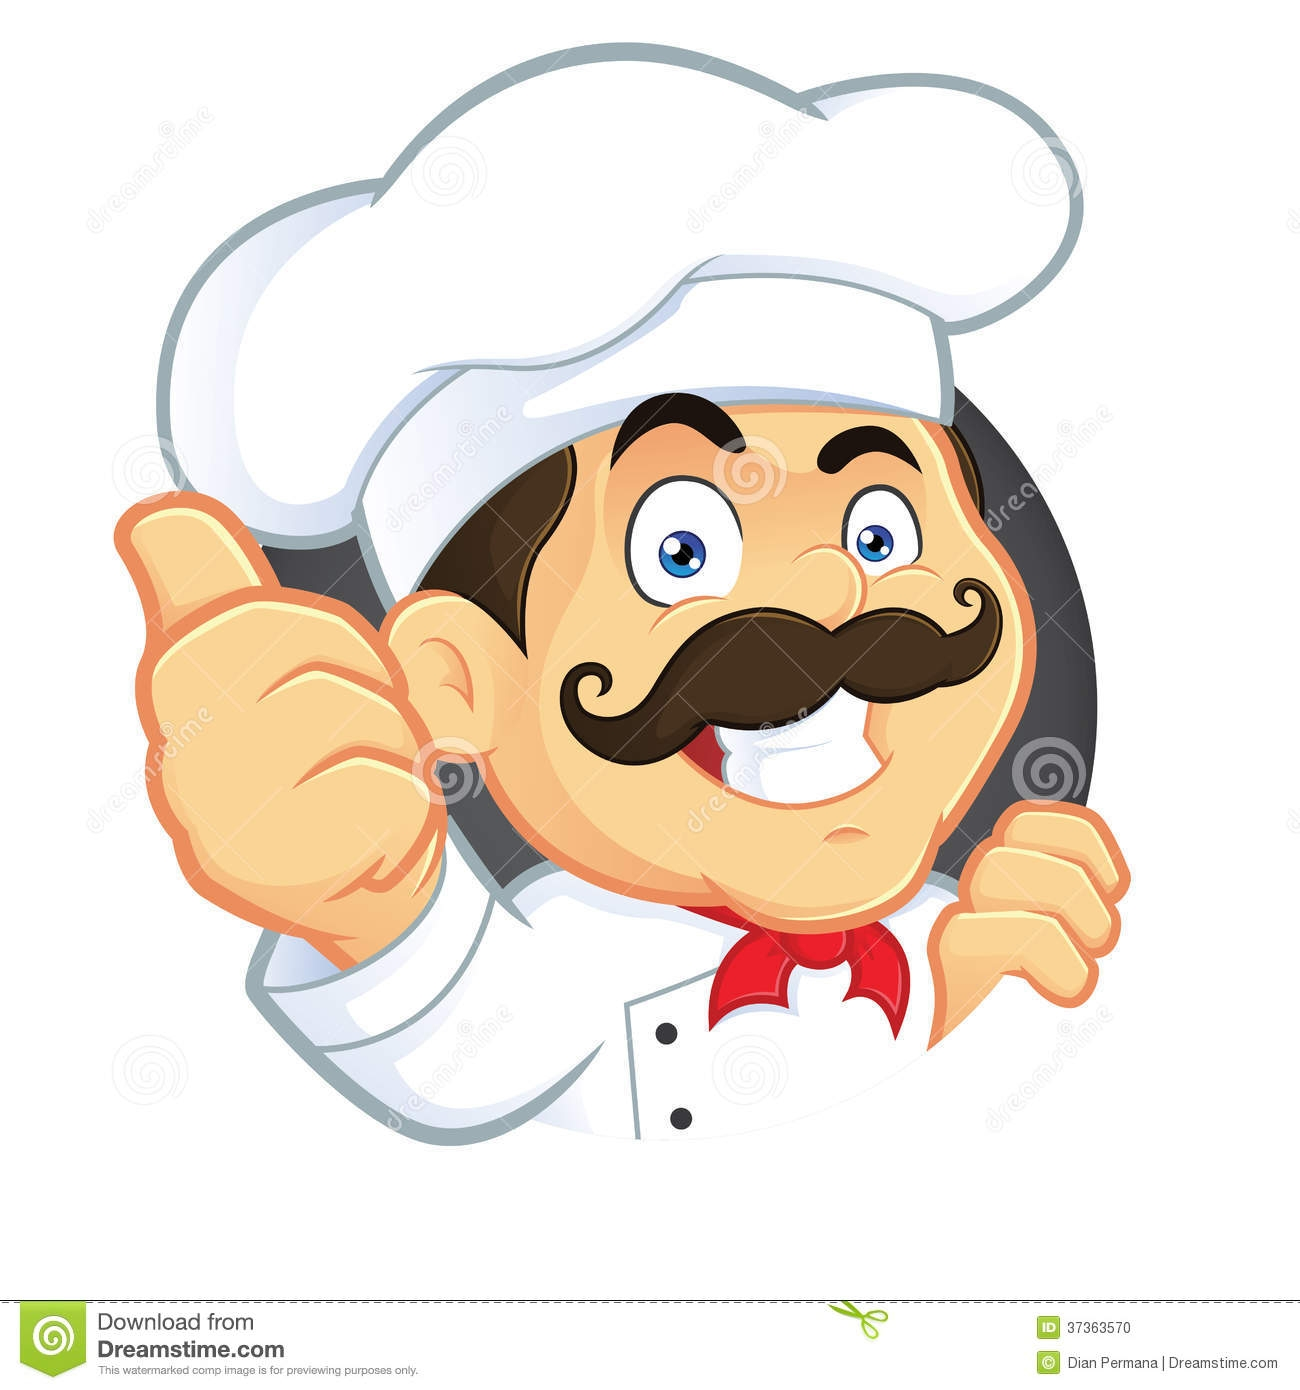 chef clipart cartoon #6